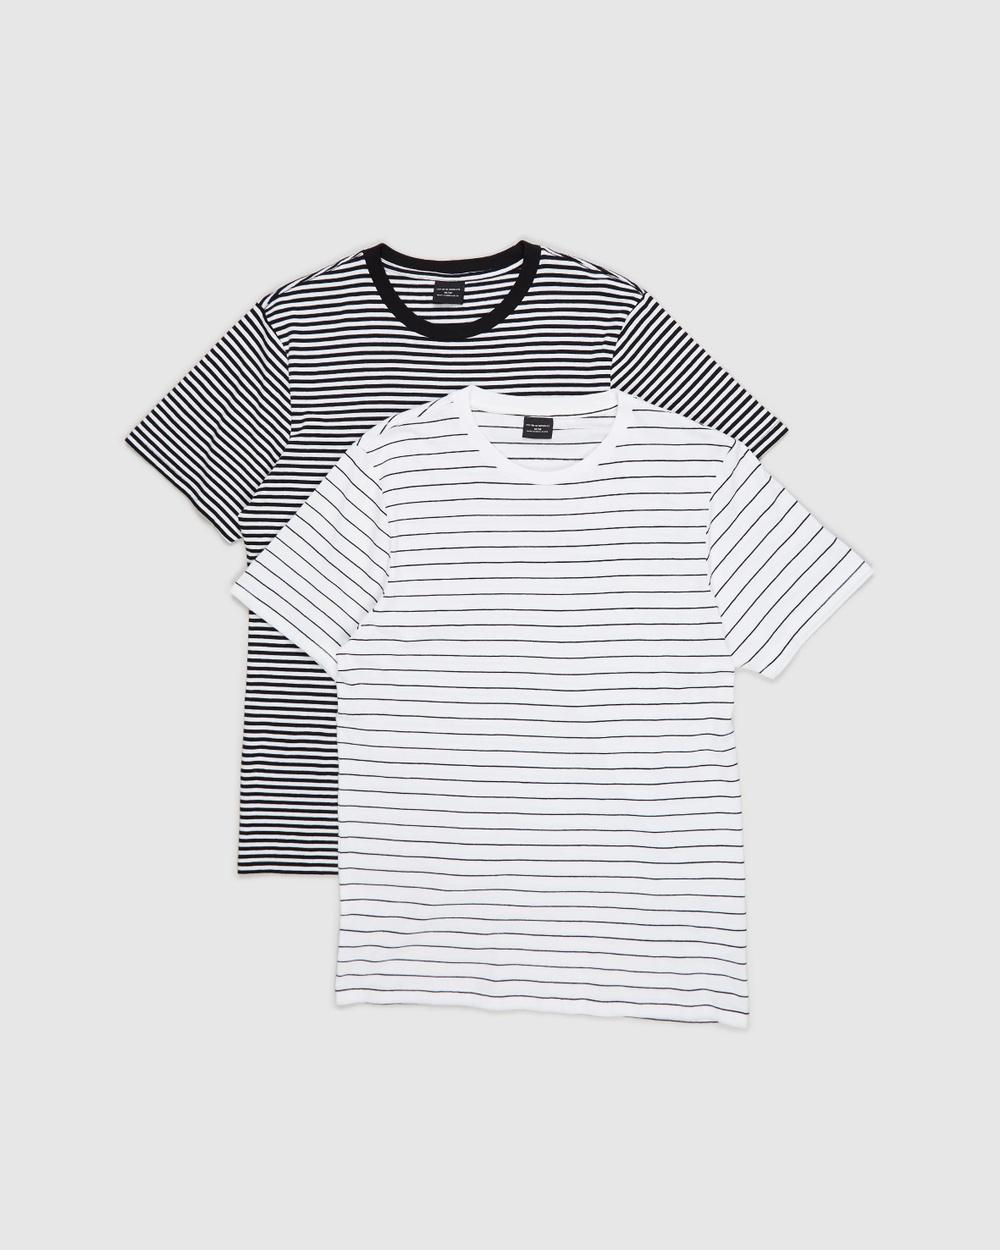 Cotton On - 2 Pack T Bar Premium T Shirt - T-Shirts & Singlets (White, Easy Stripe & Black & White 50/50 Stripe) 2-Pack T-Bar Premium T-Shirt